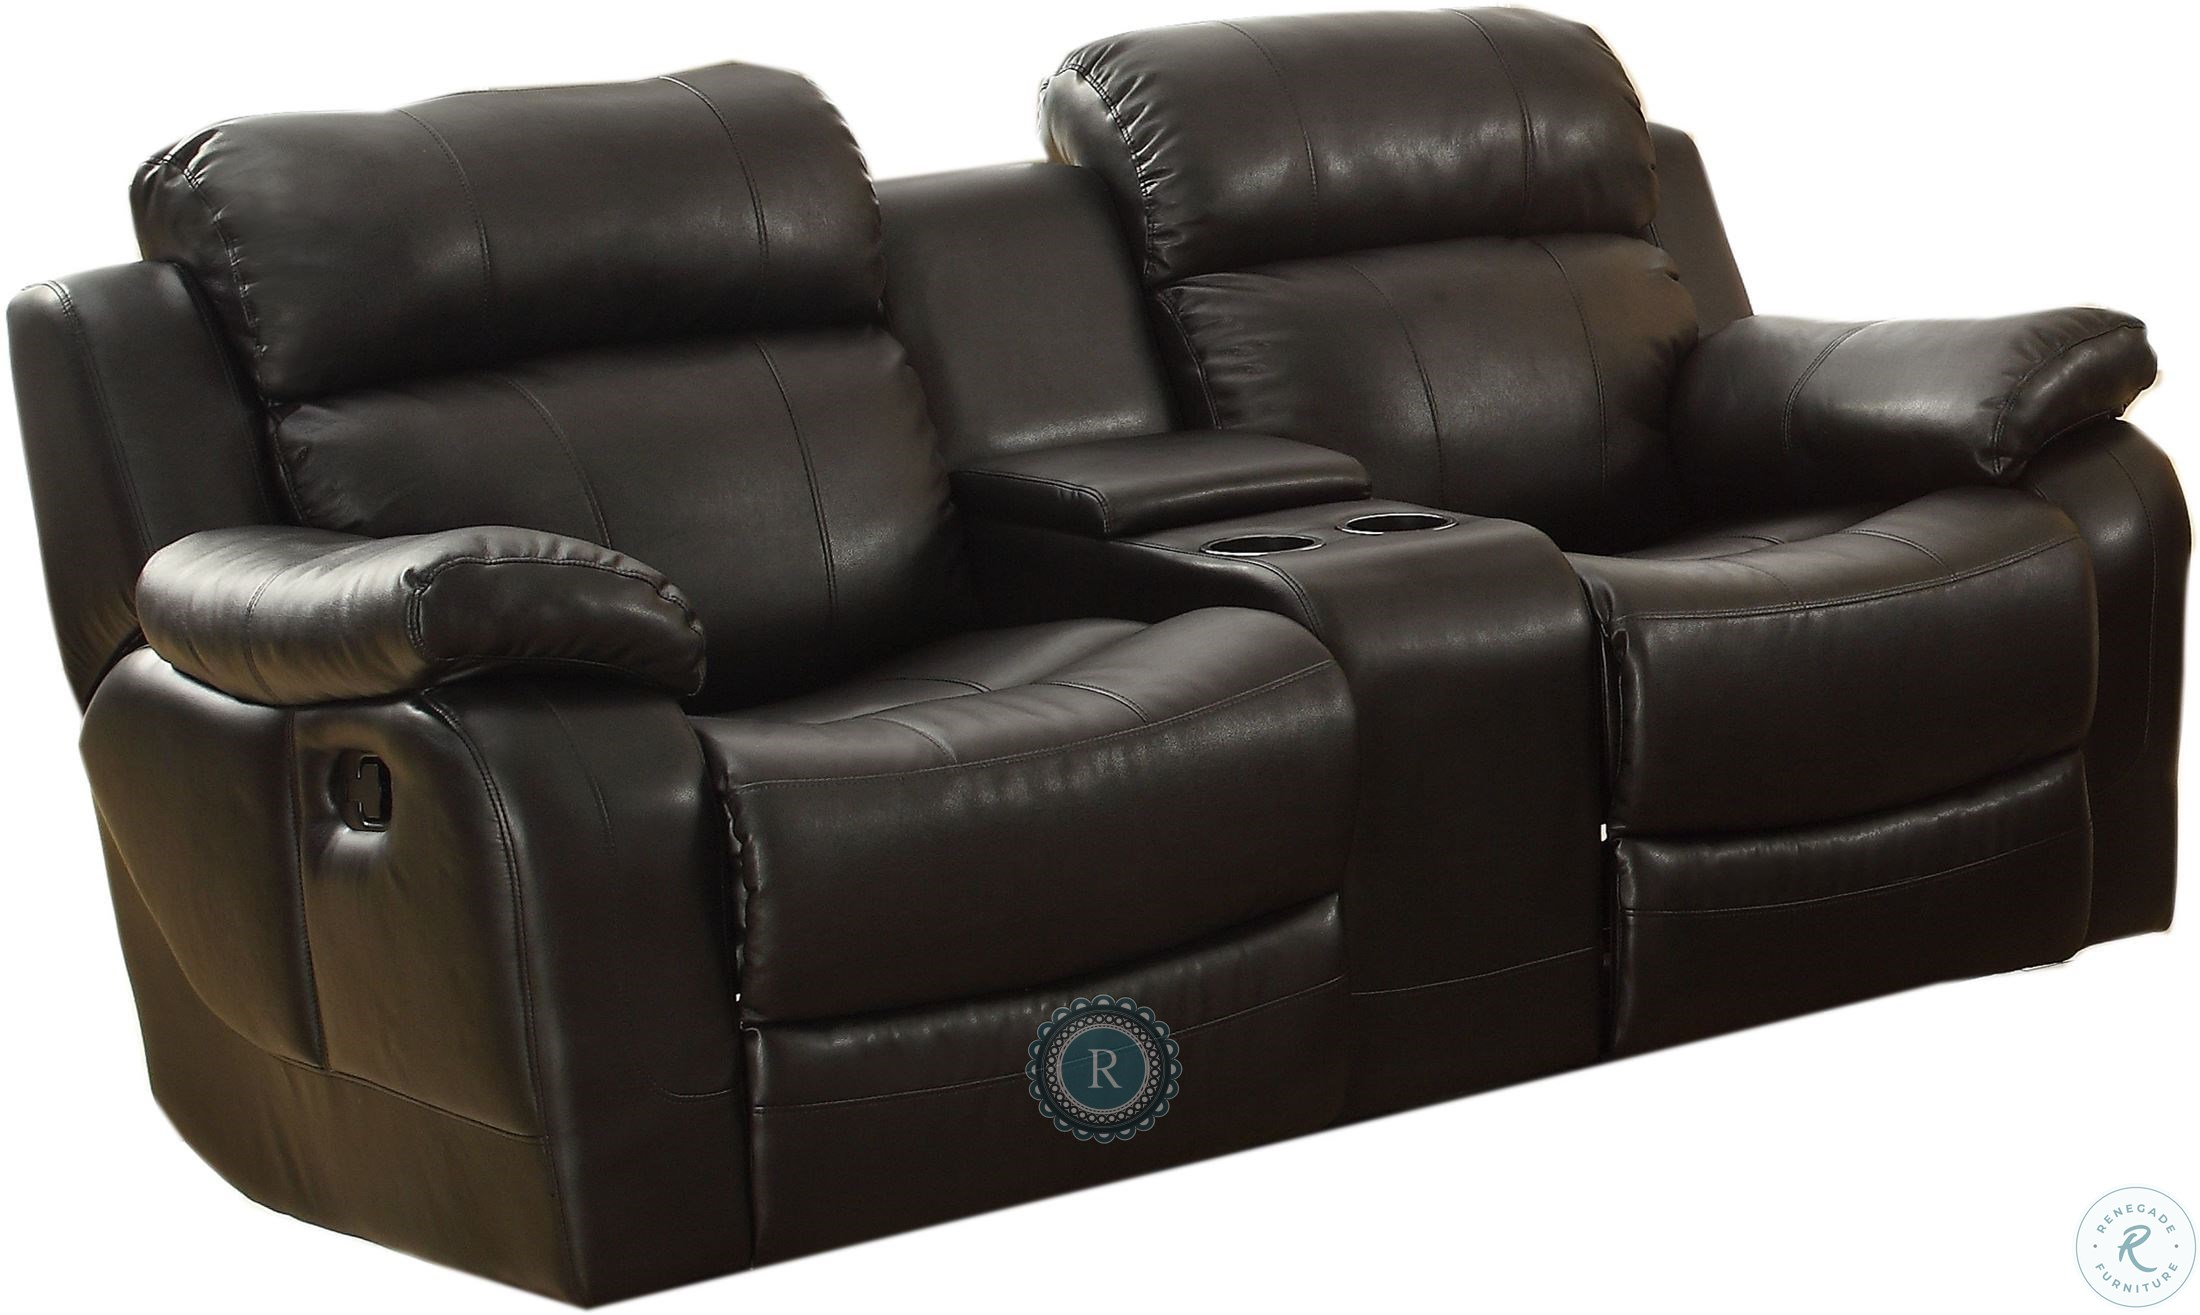 Wondrous Marille Black Double Glider Reclining Loveseat With Center Console Inzonedesignstudio Interior Chair Design Inzonedesignstudiocom